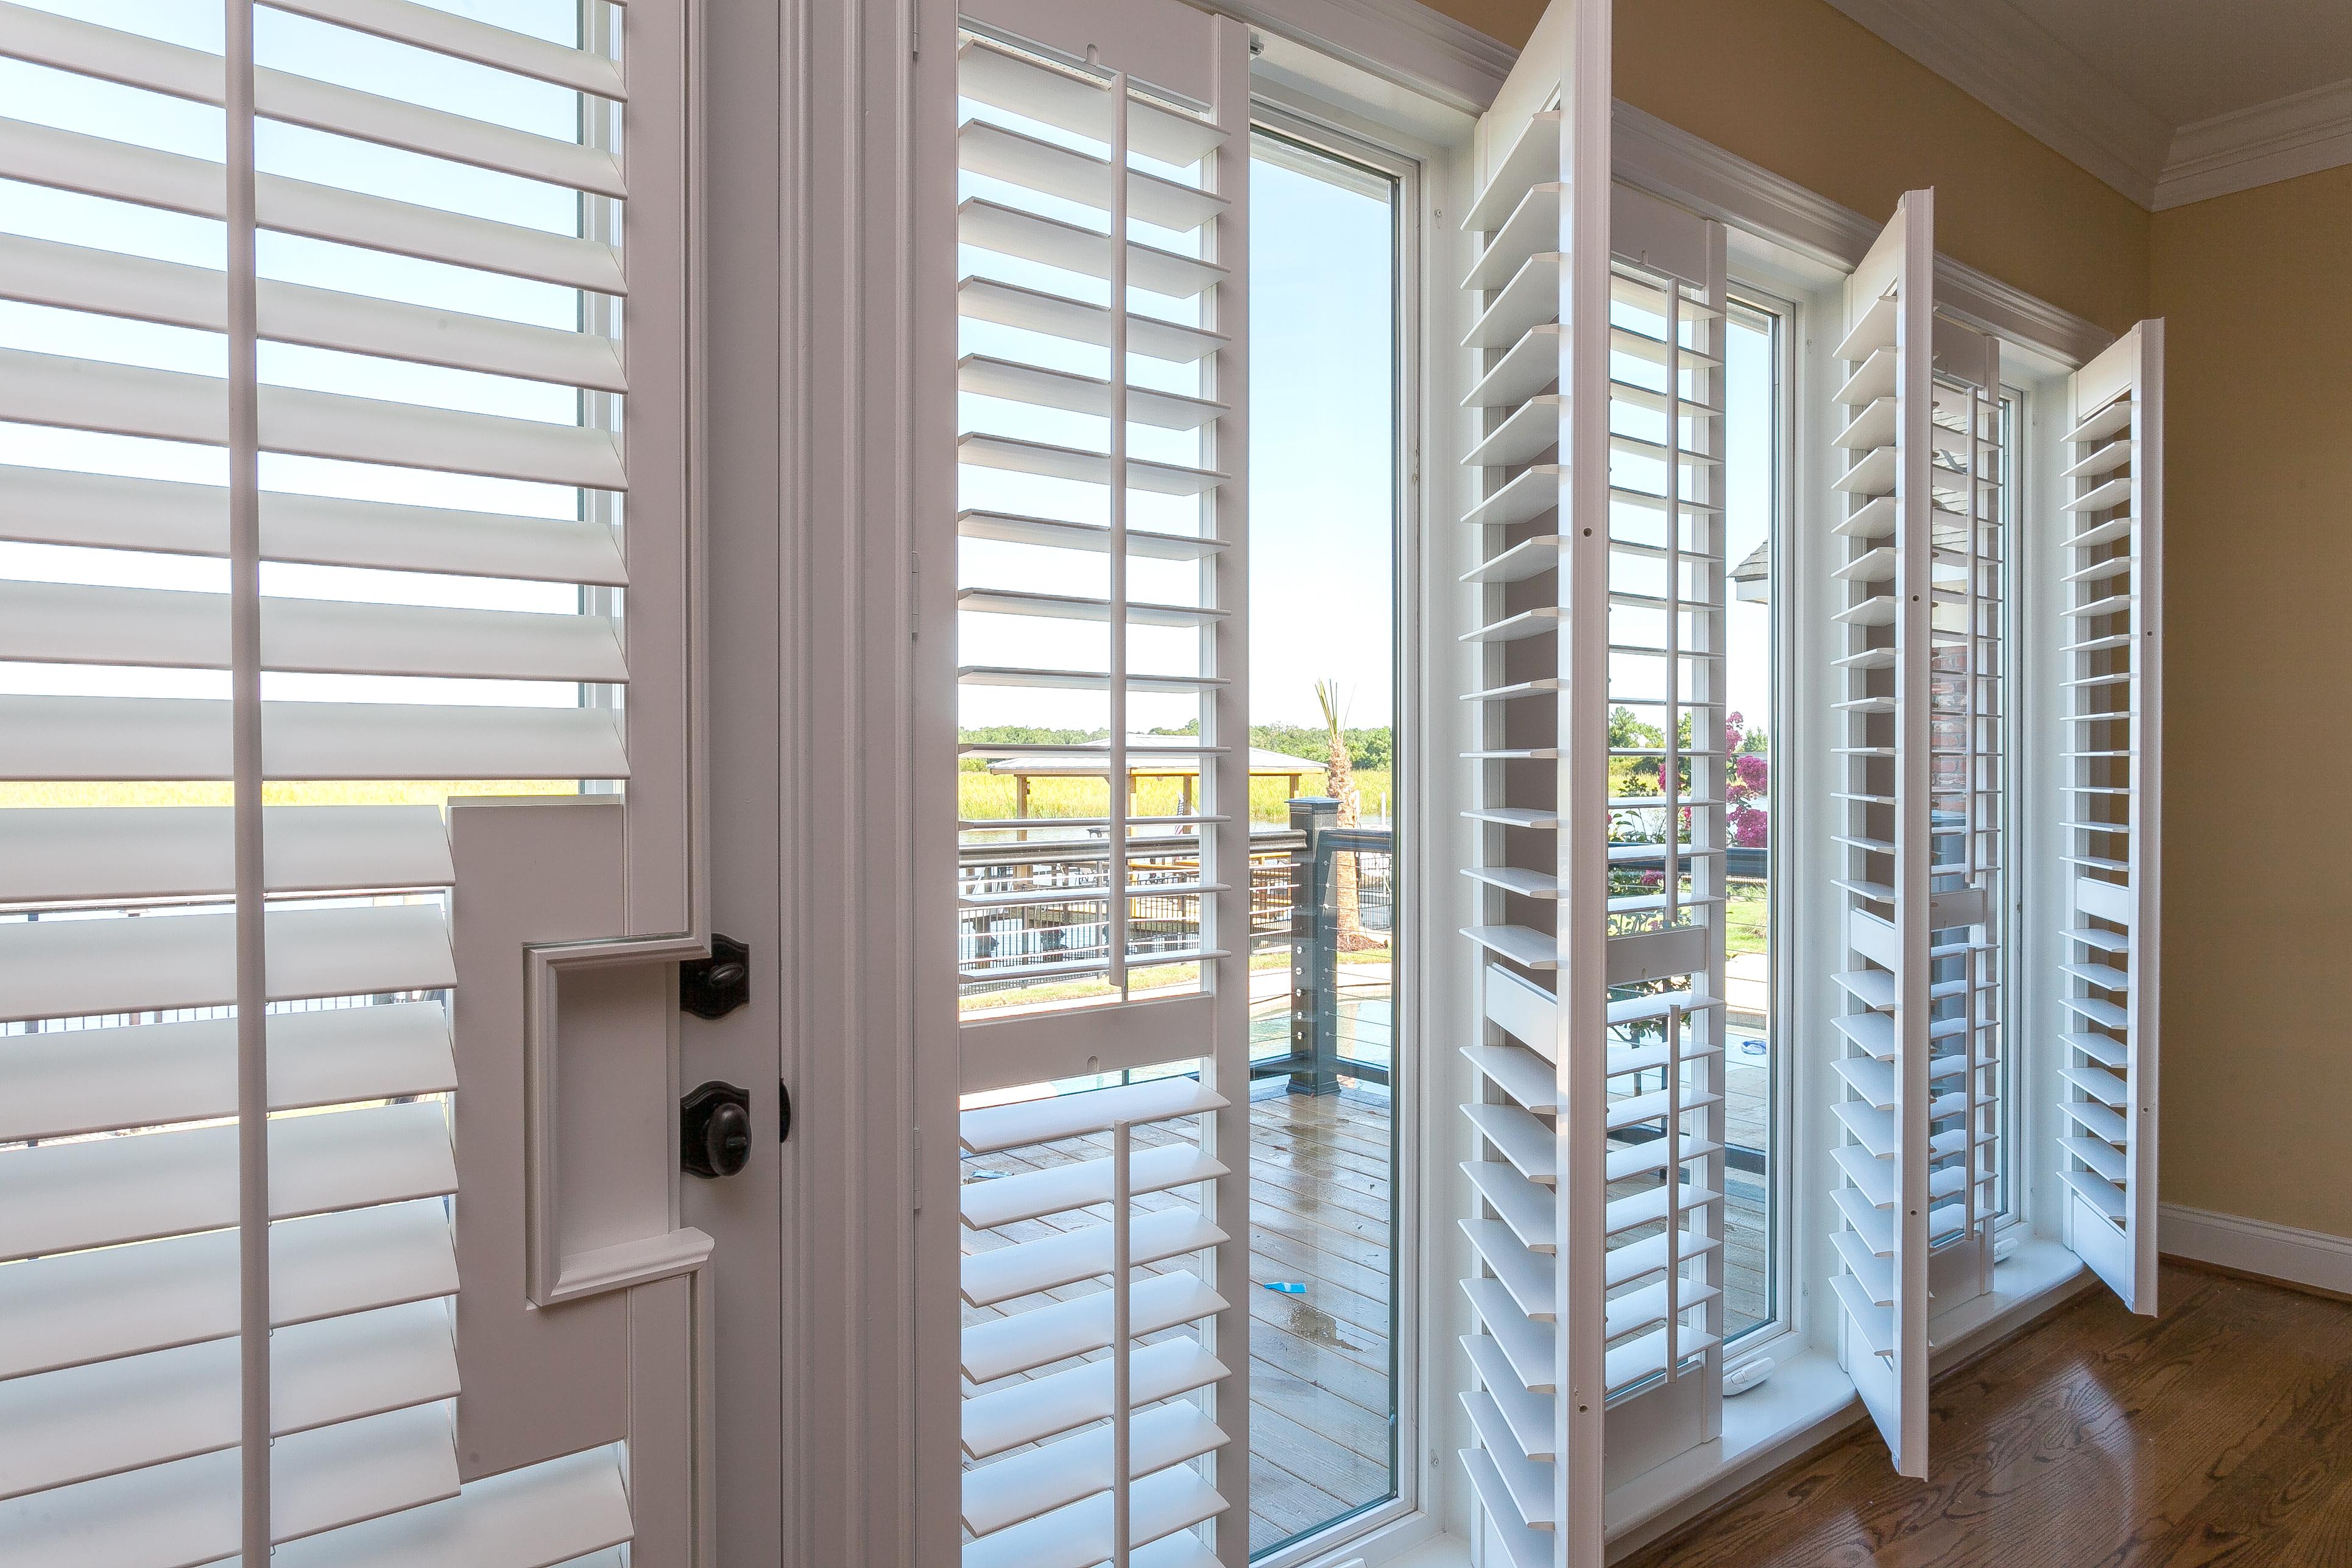 Siding, Windows, And Doors. DSCN0665 CBMurray_1004DominionDr_Fall15_11